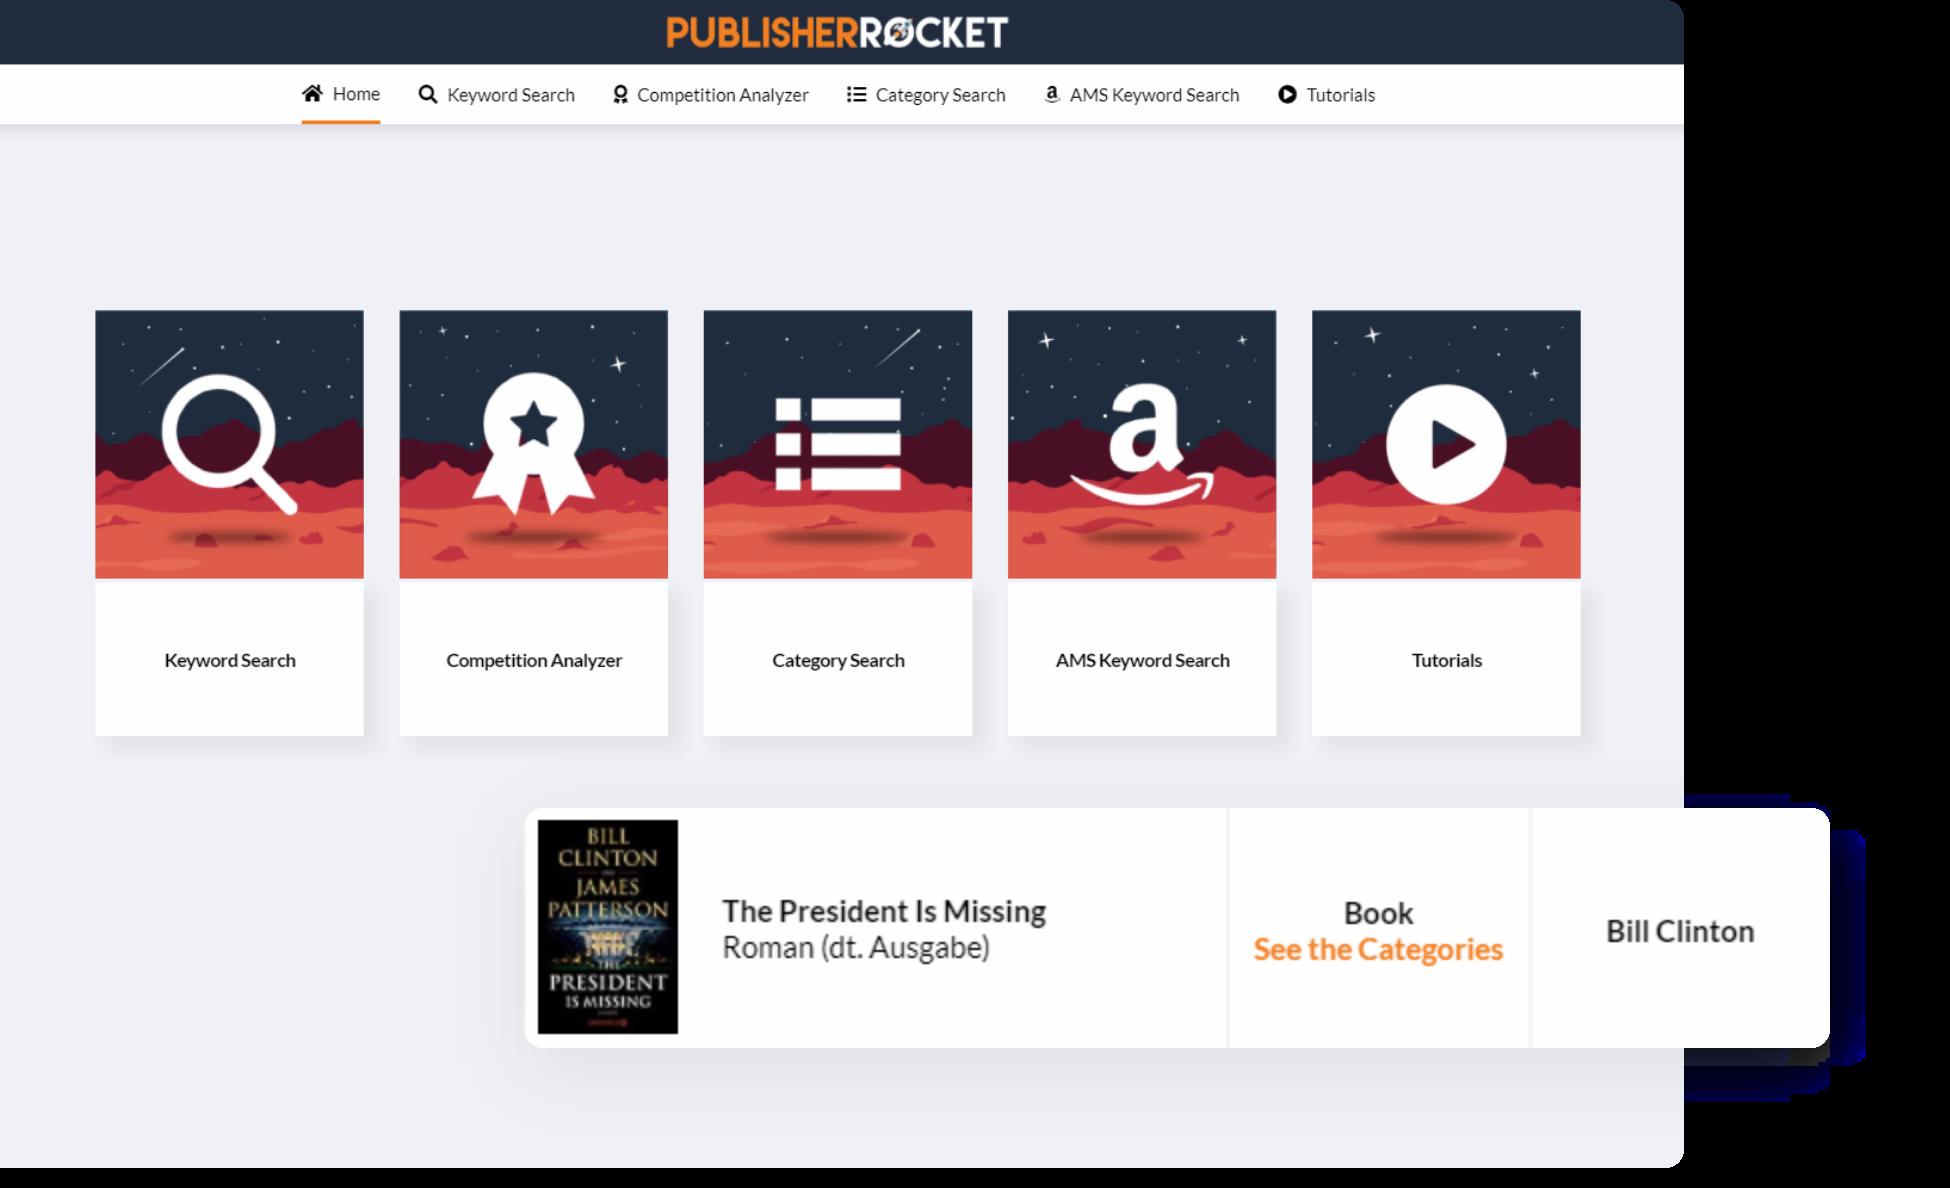 Publisher Rocket Dashboard